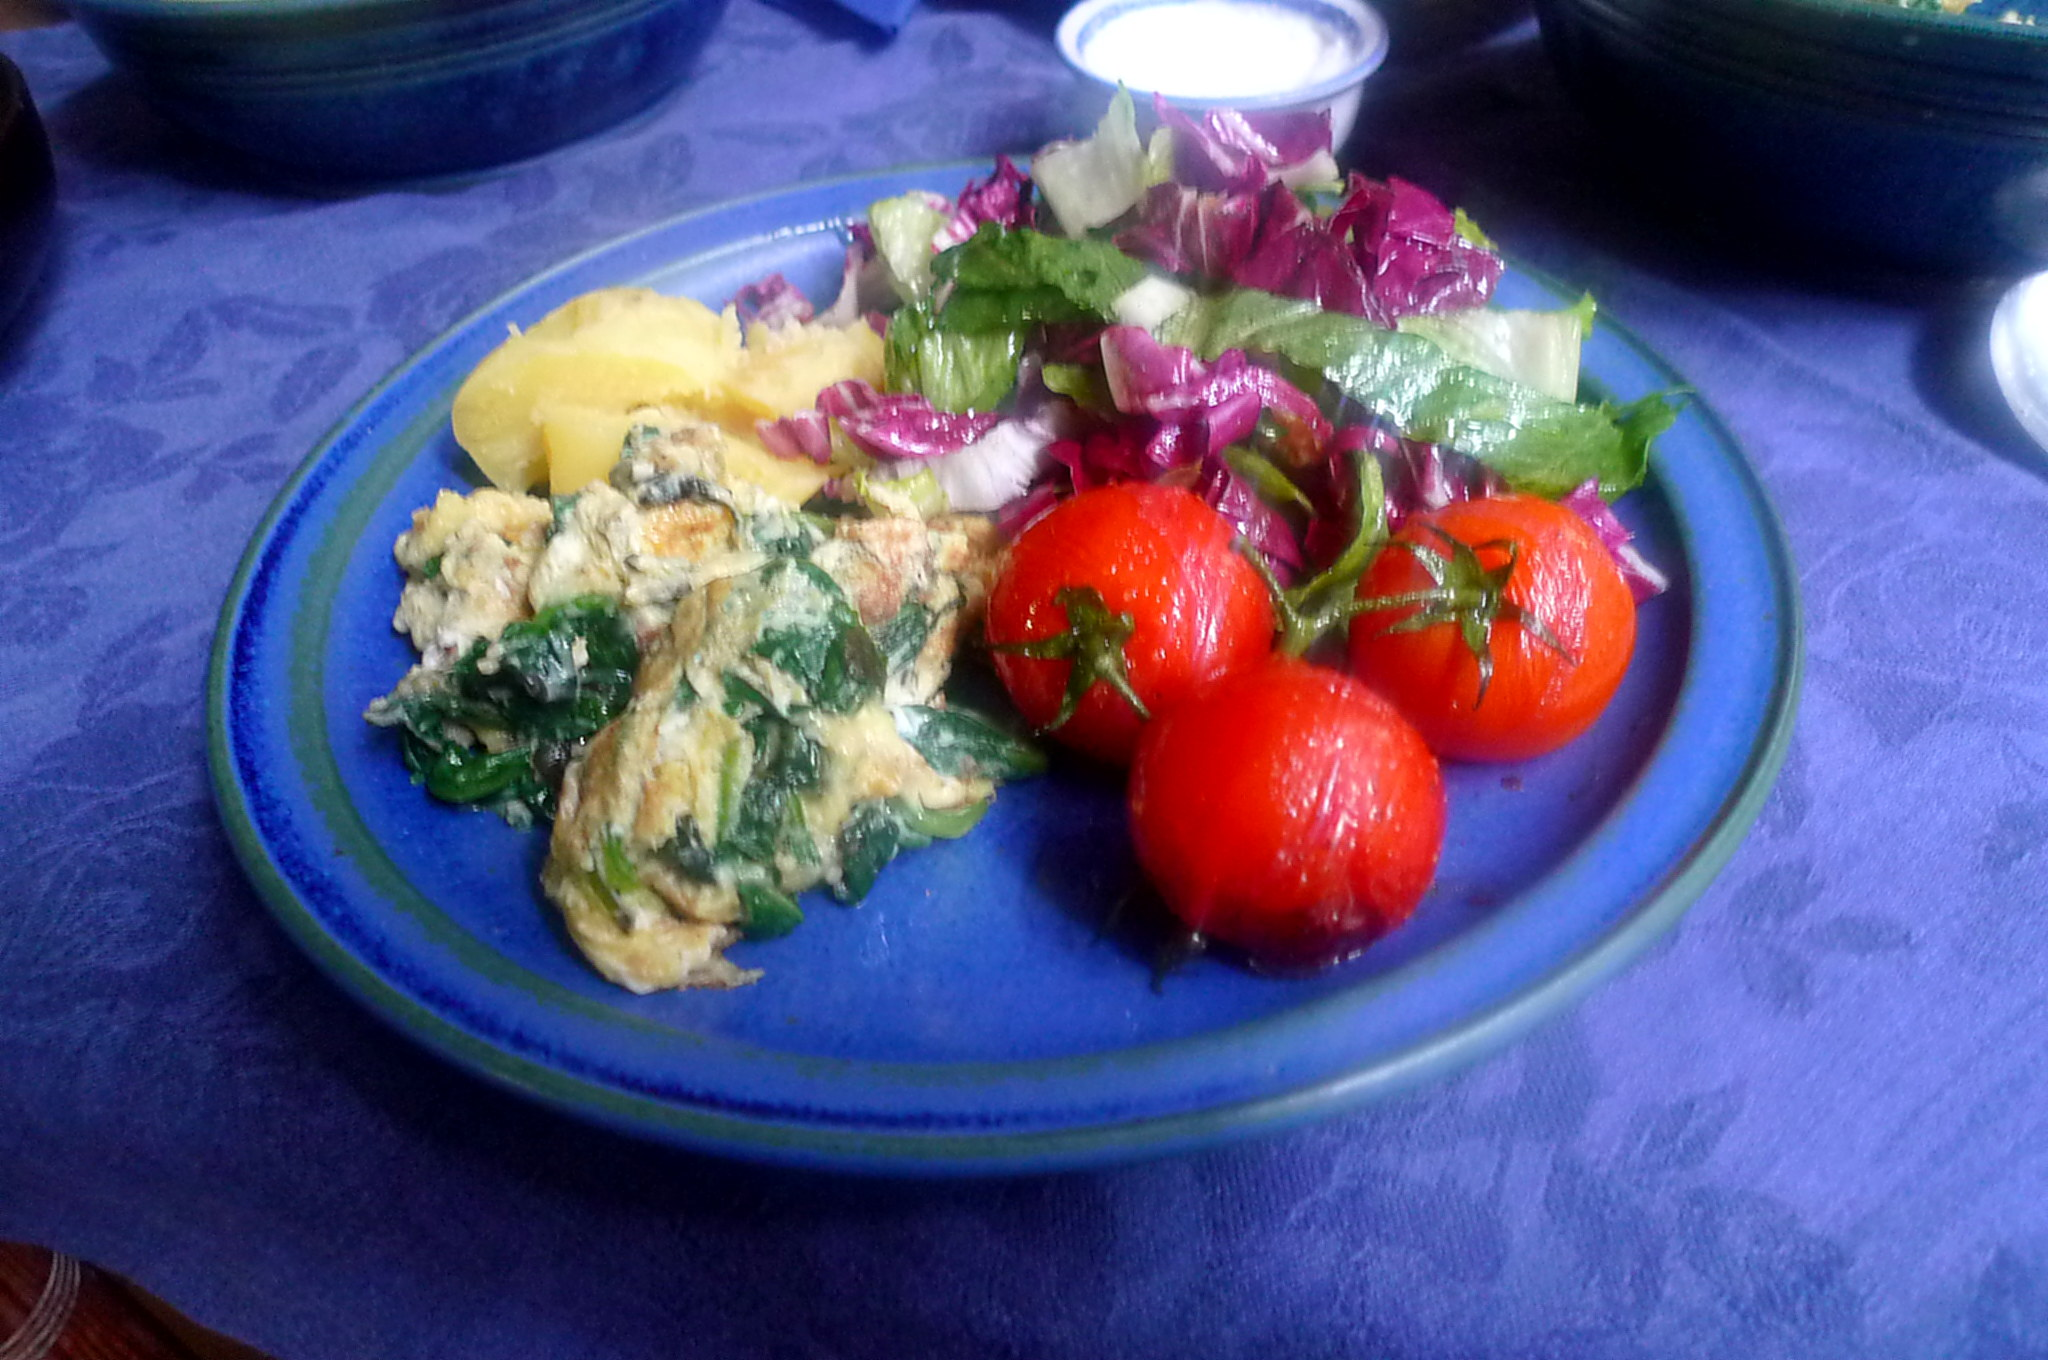 Spinat mit Rührei,Salat,Kartoffel,gebratene Tomaten -- 11.9.14   (11)